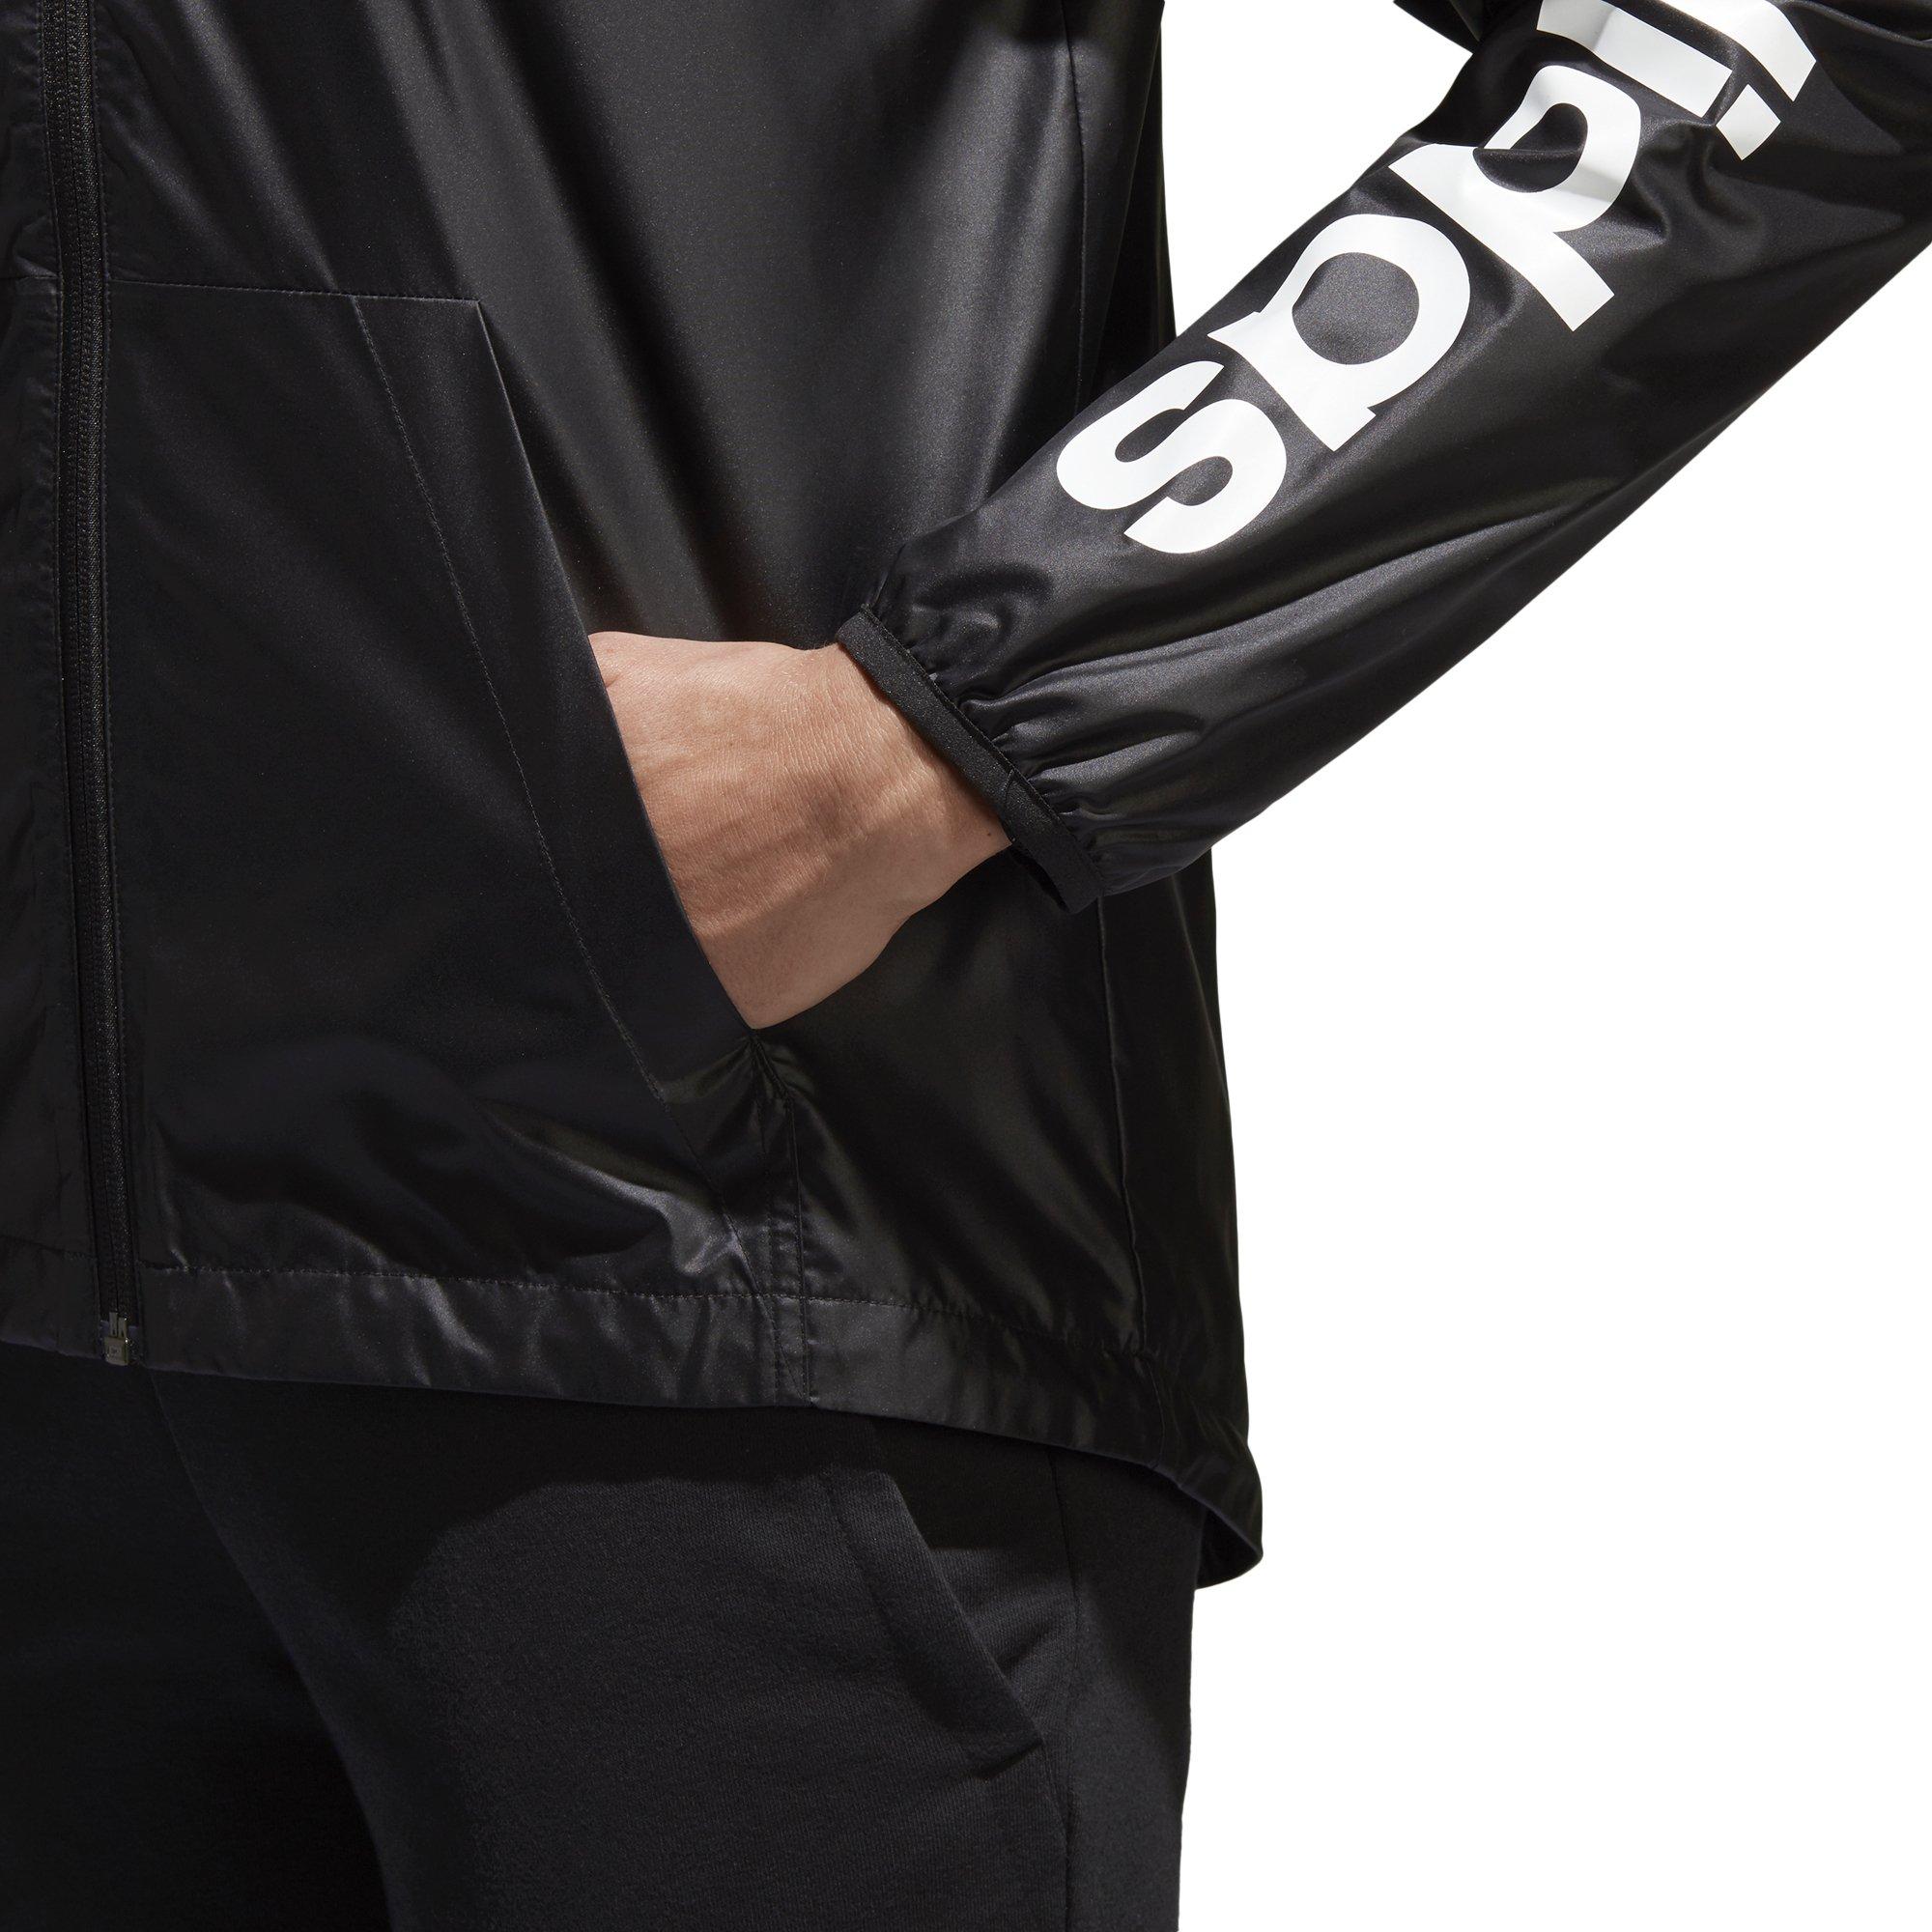 adidas Women's Linear Windbreaker Jacket, Black, Large by adidas (Image #7)